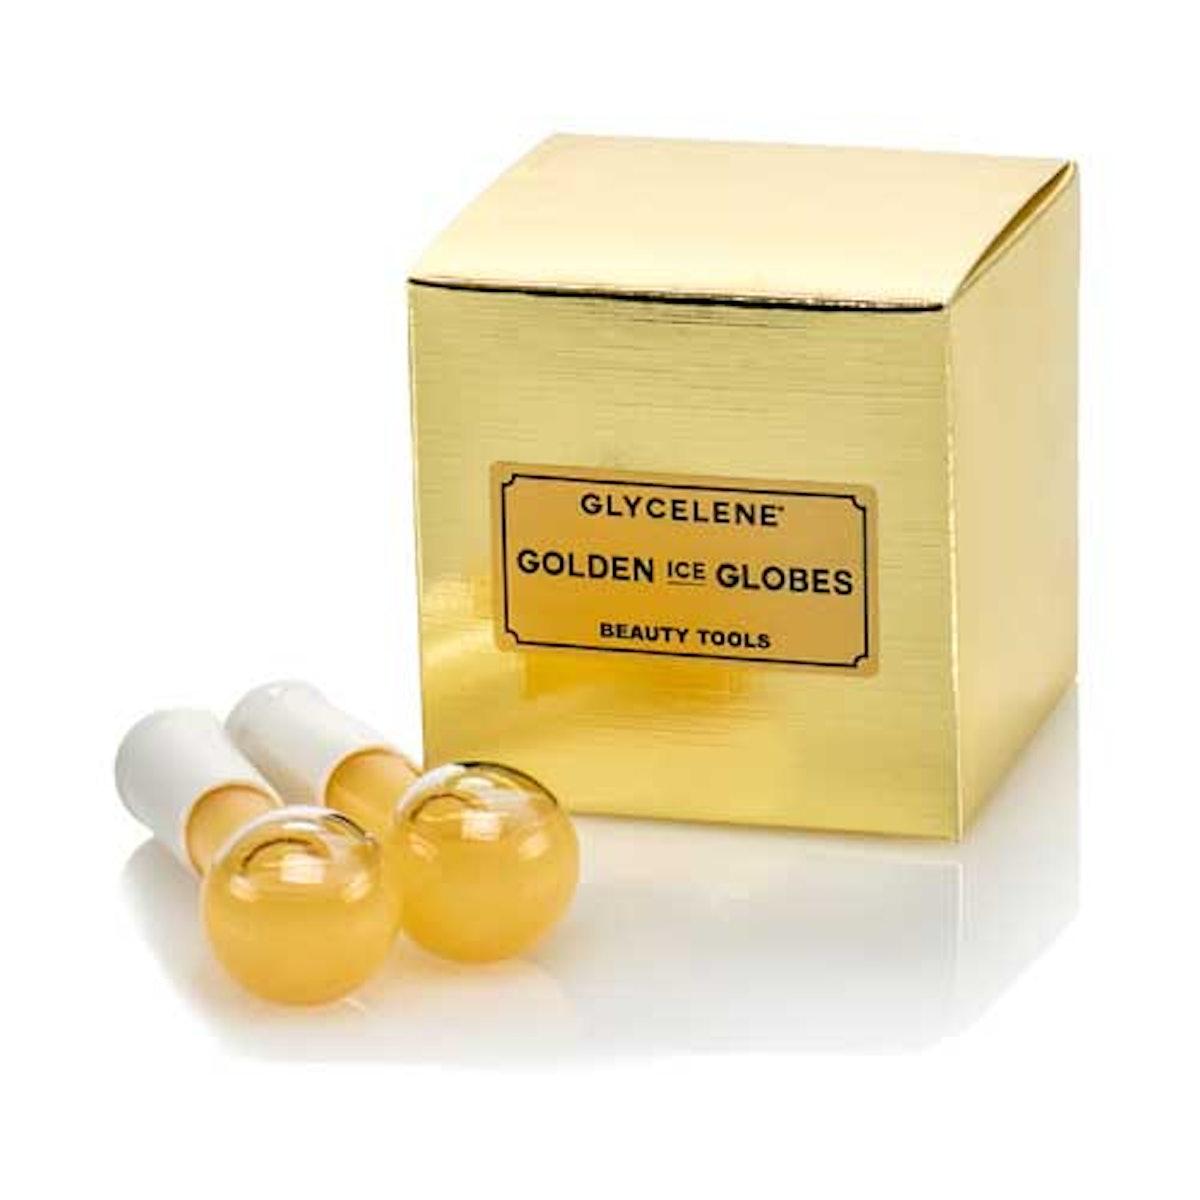 Golden Ice Globes